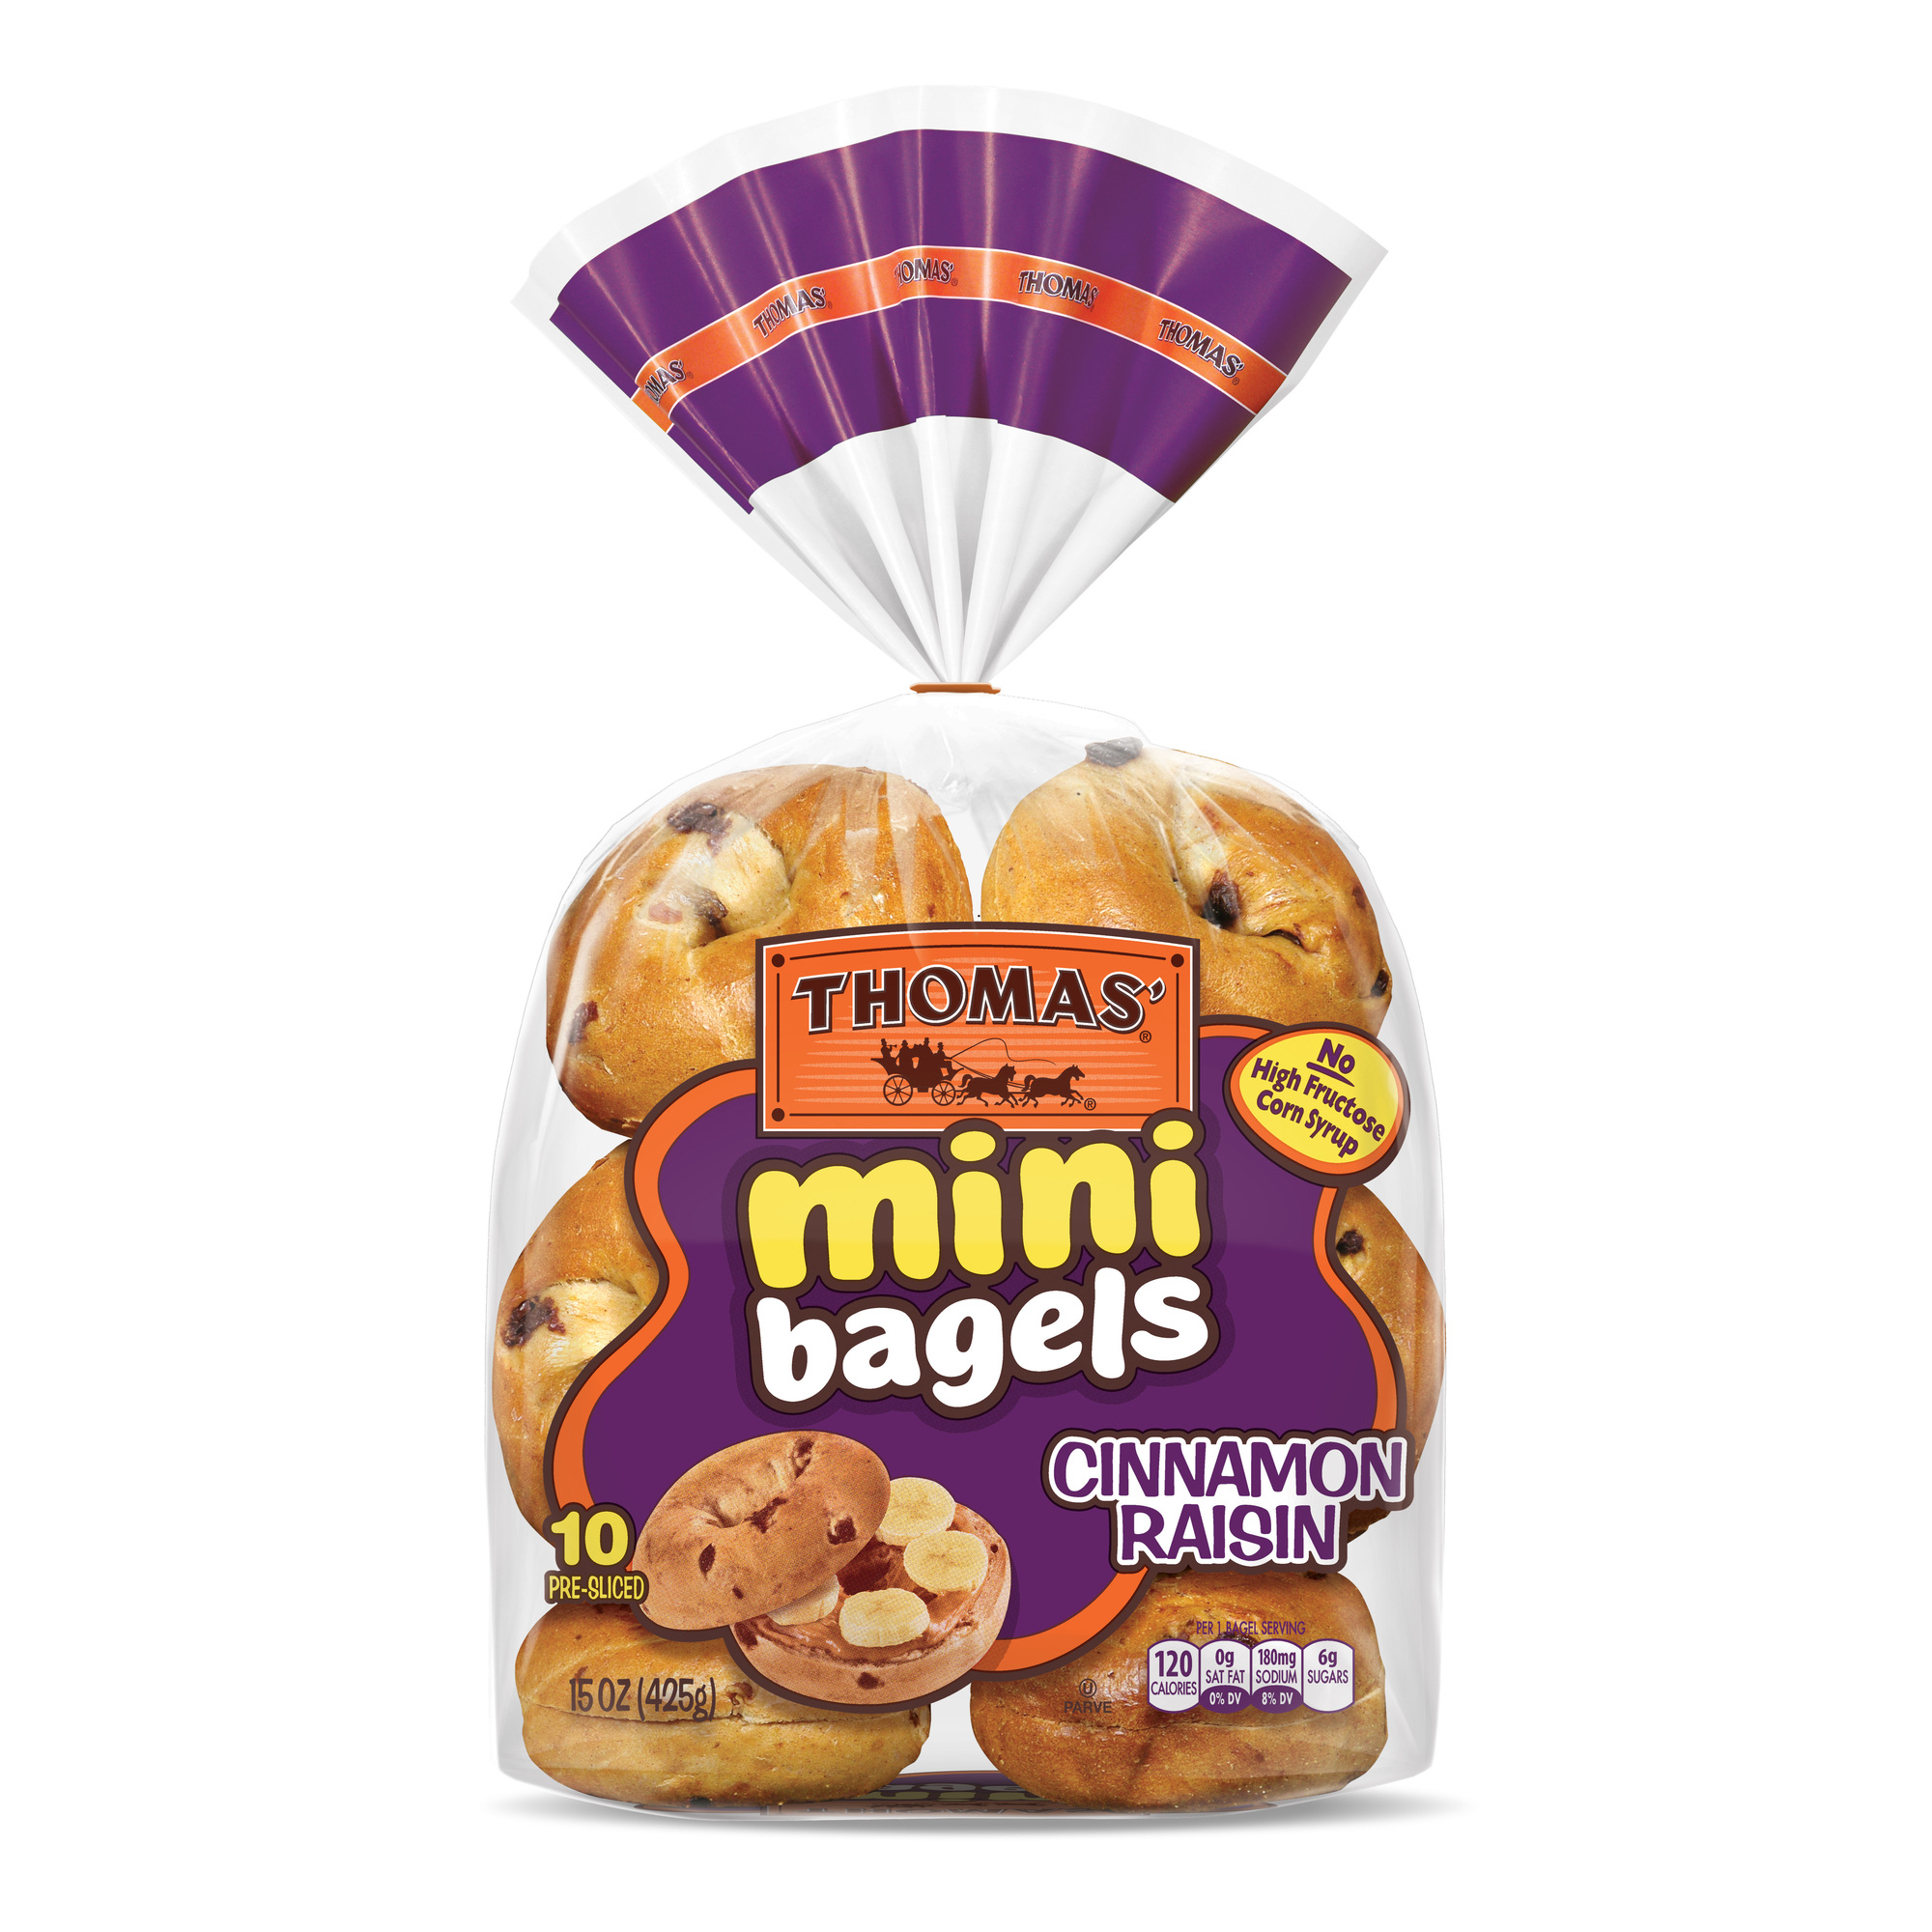 Thomas' Mini Bagels Cinnamon Raisin - 10 CT